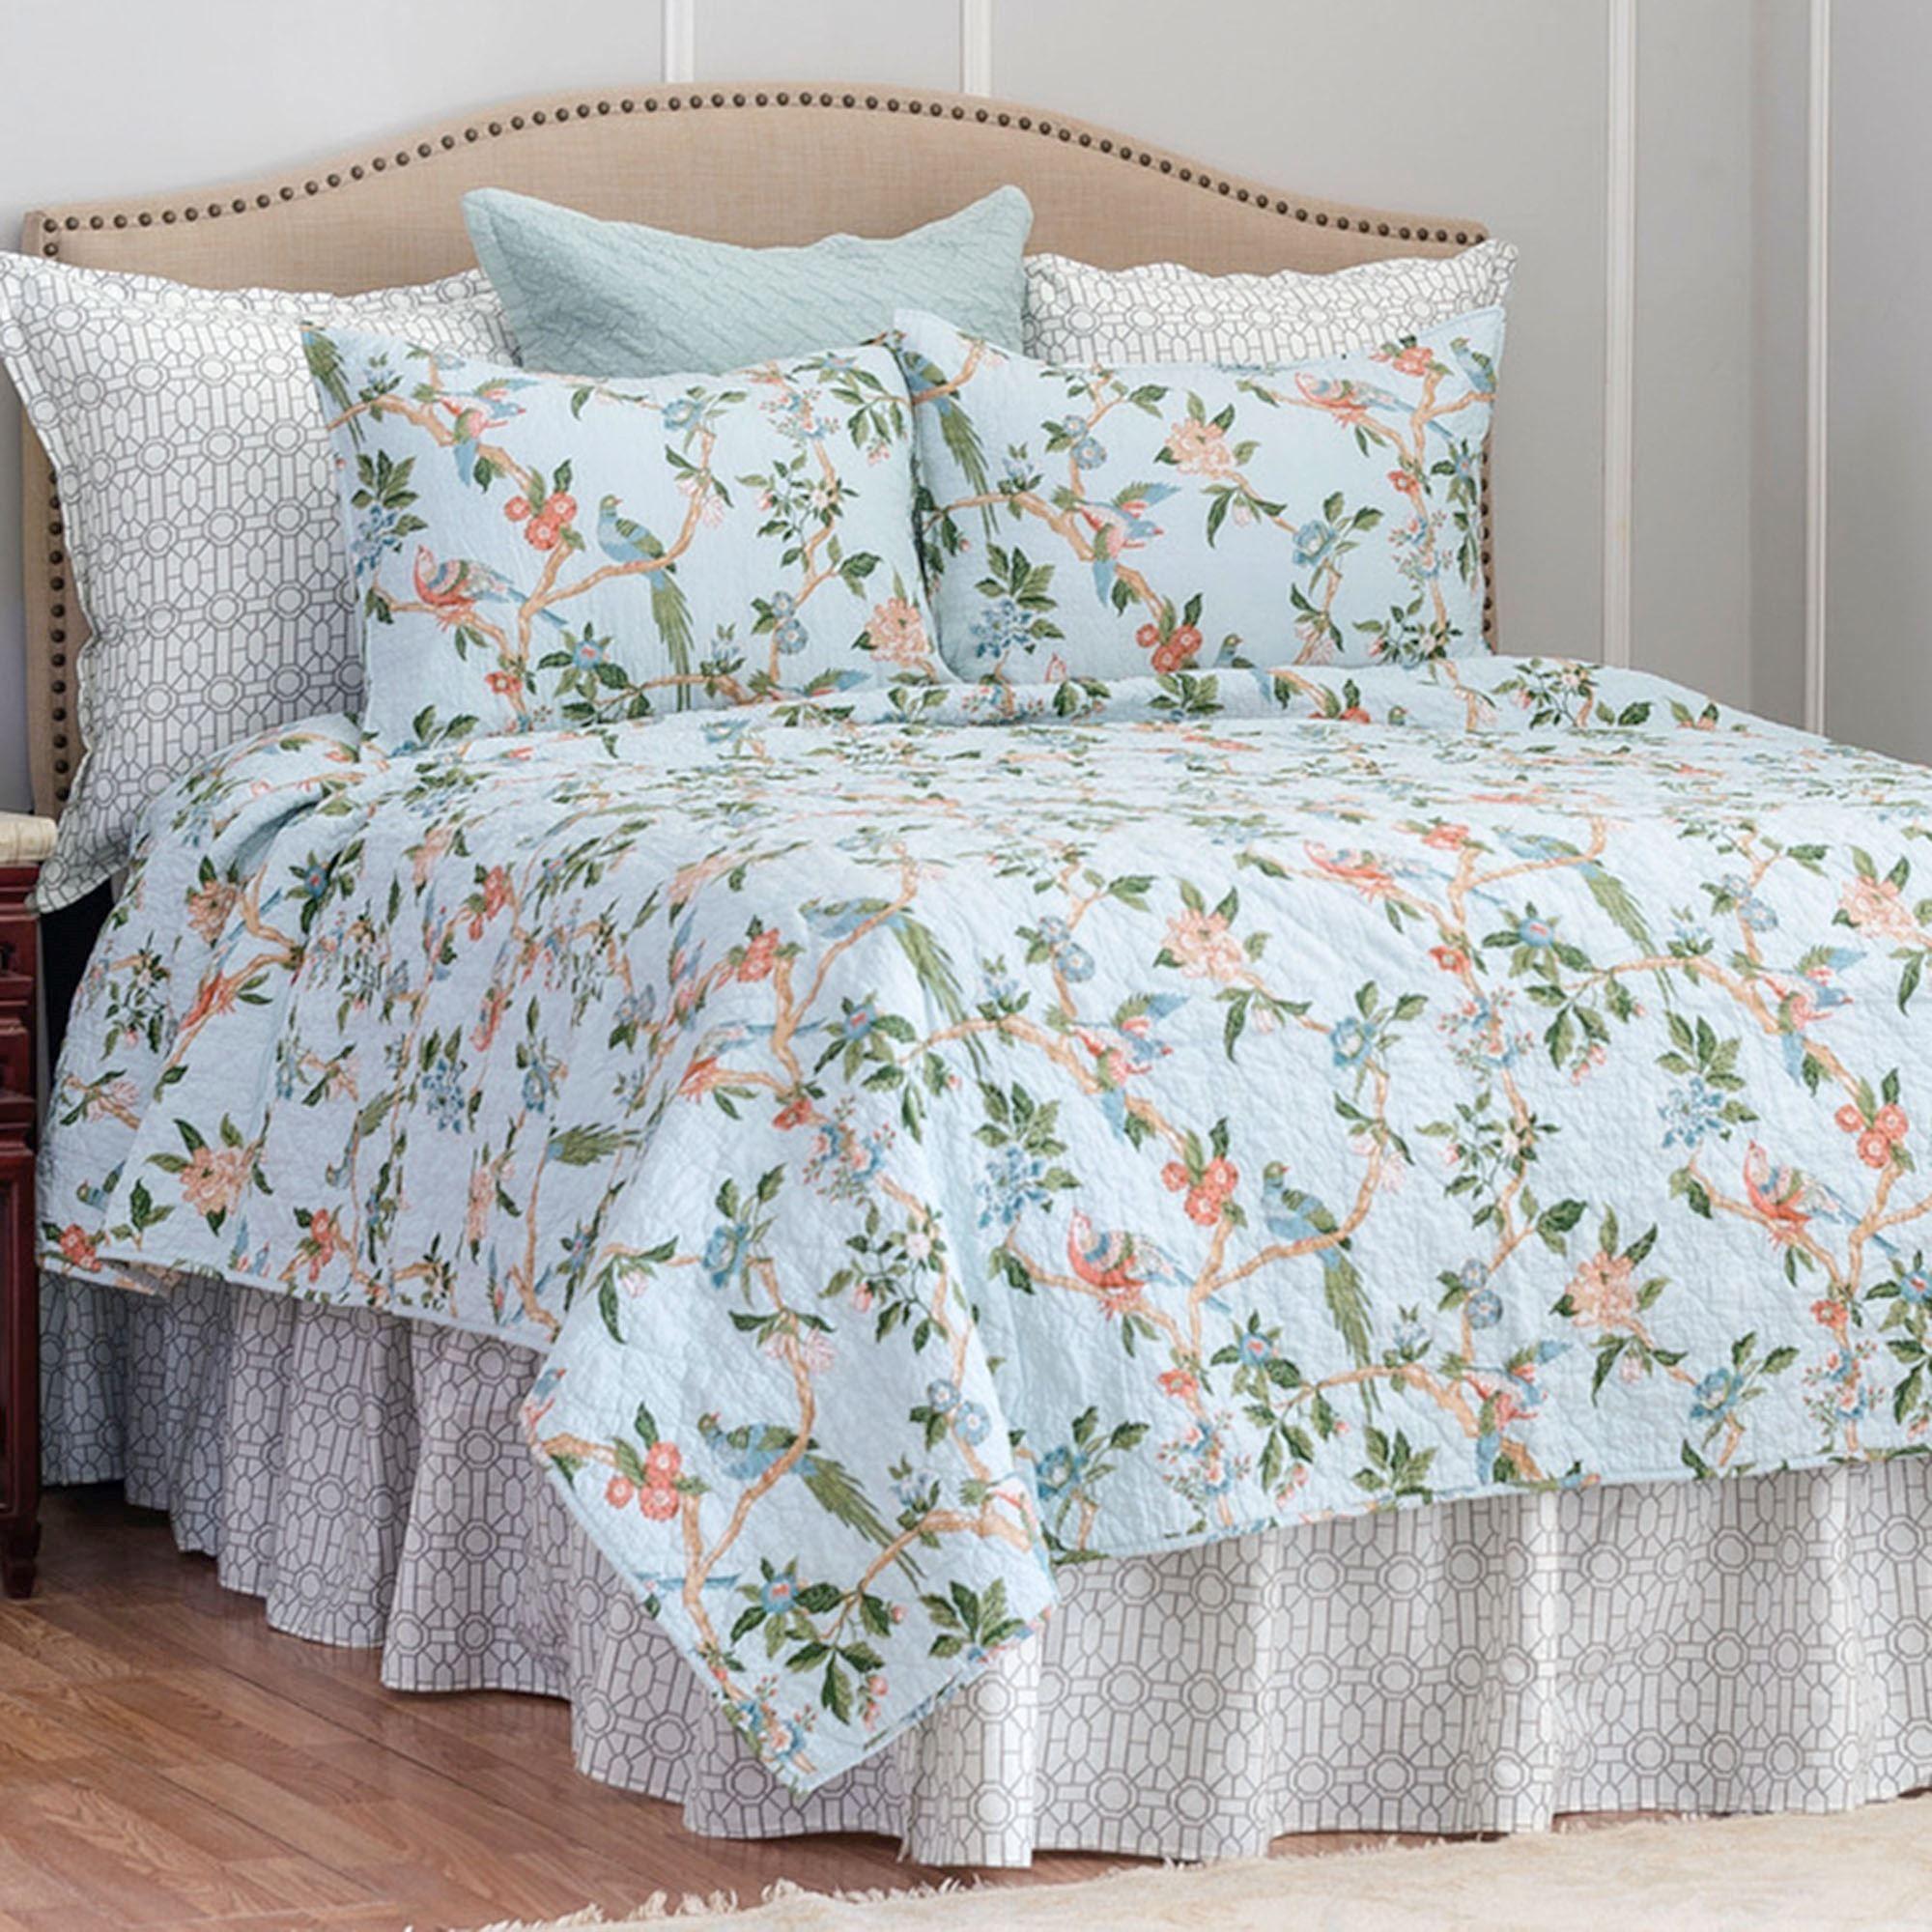 3PCS Double Floral Blue Cotton Quilt Coverlet Bedspread Set Shabby French Chic